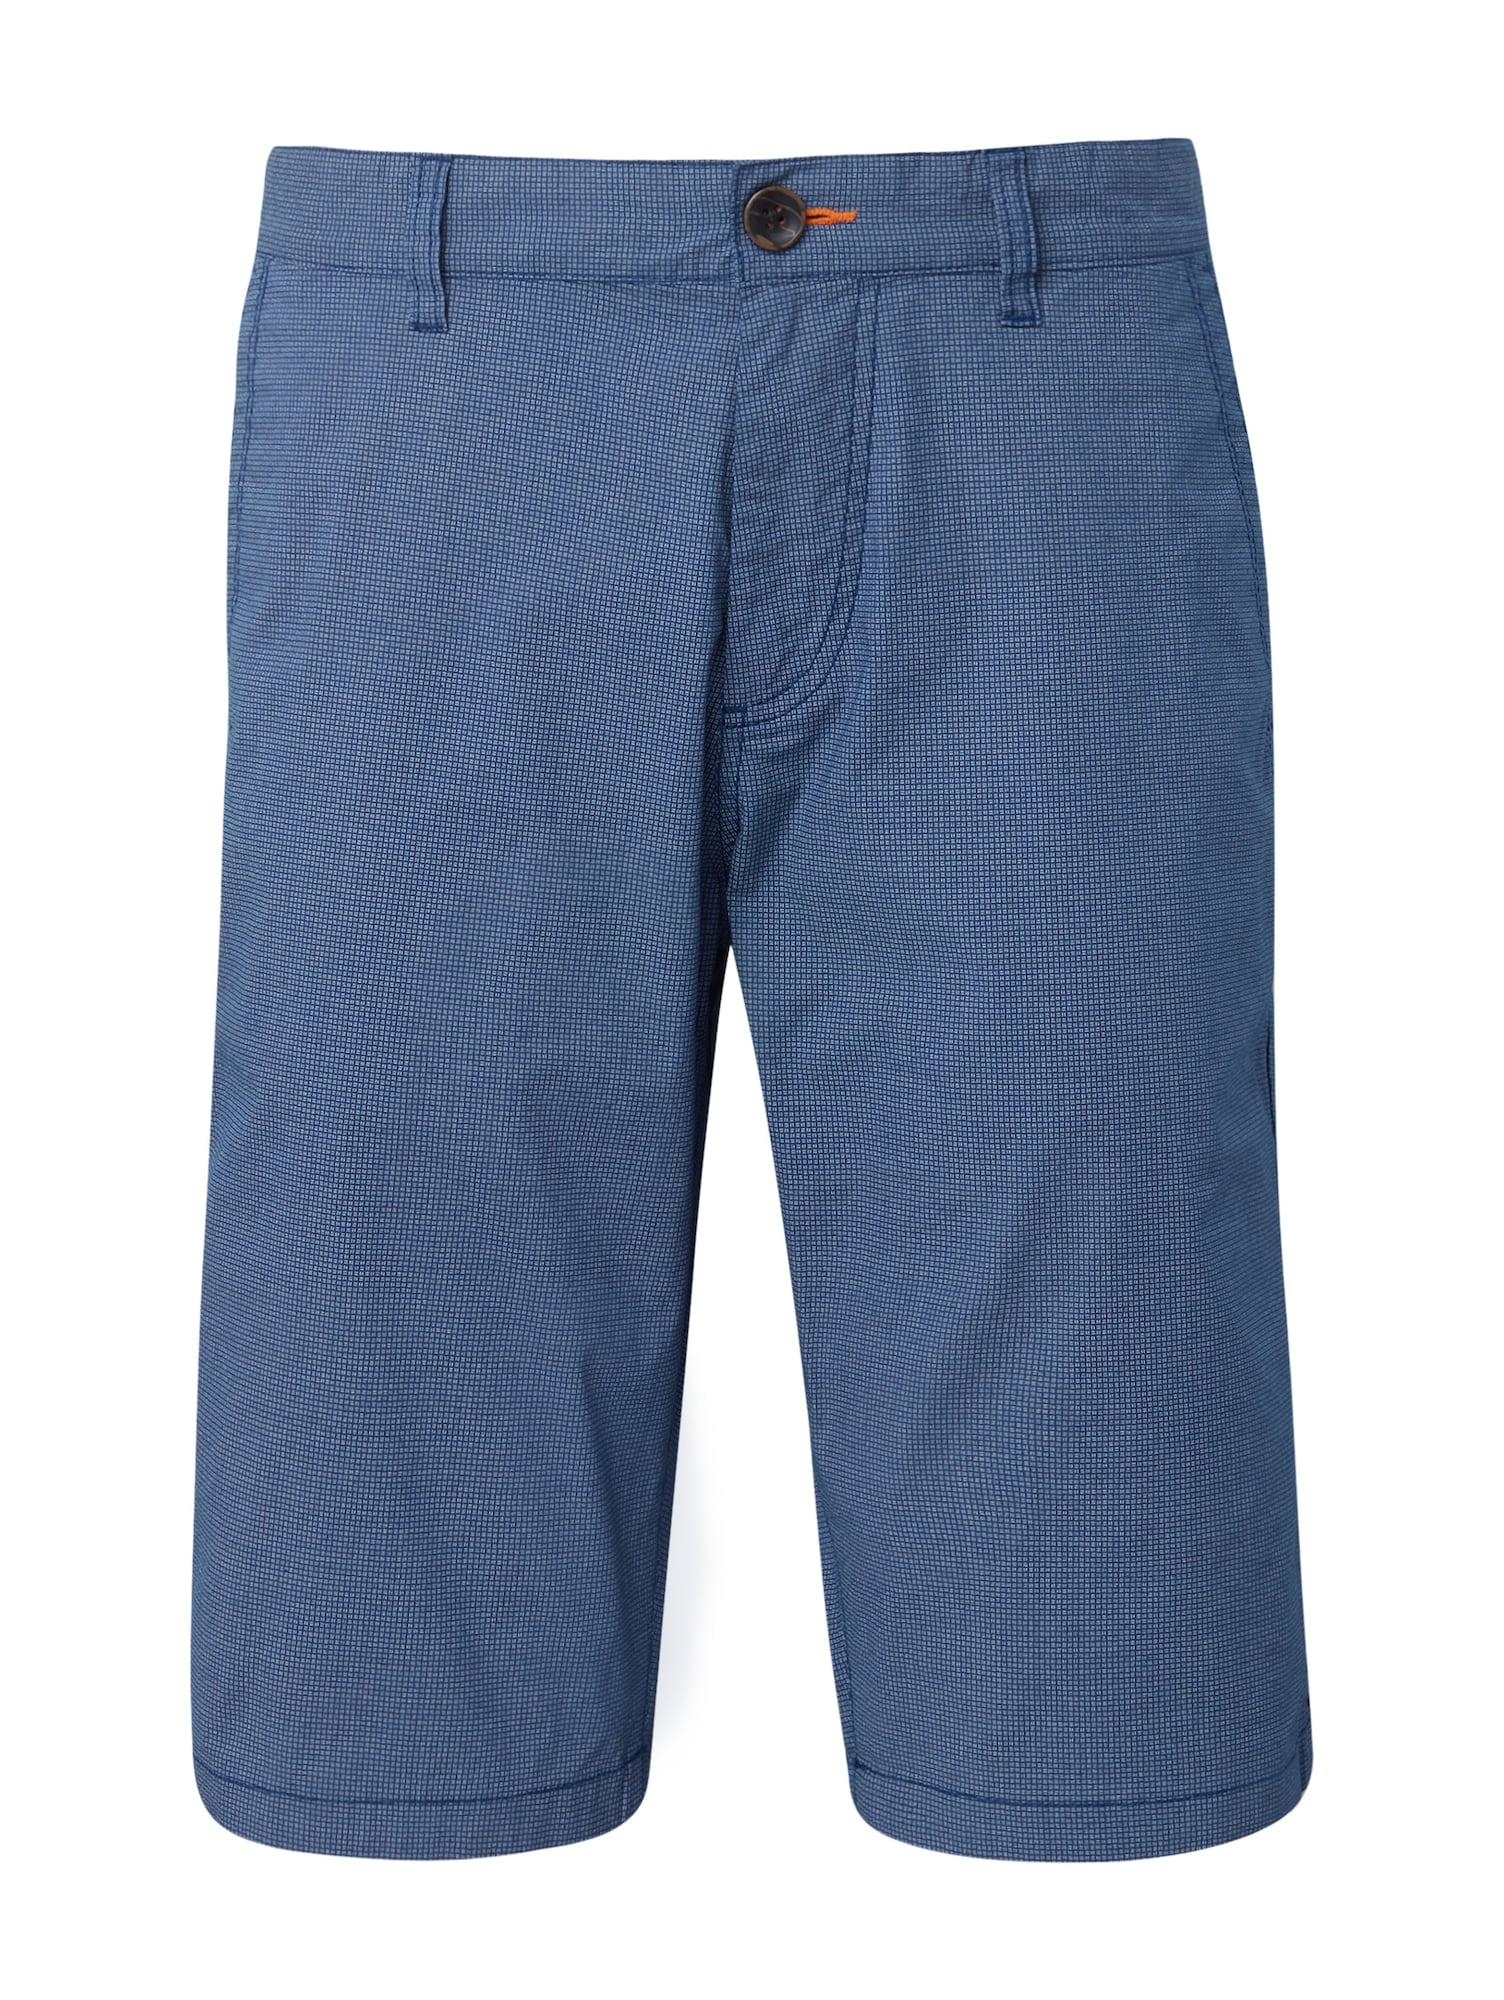 Shorts 'Josh' | Bekleidung > Shorts & Bermudas | TOM TAILOR